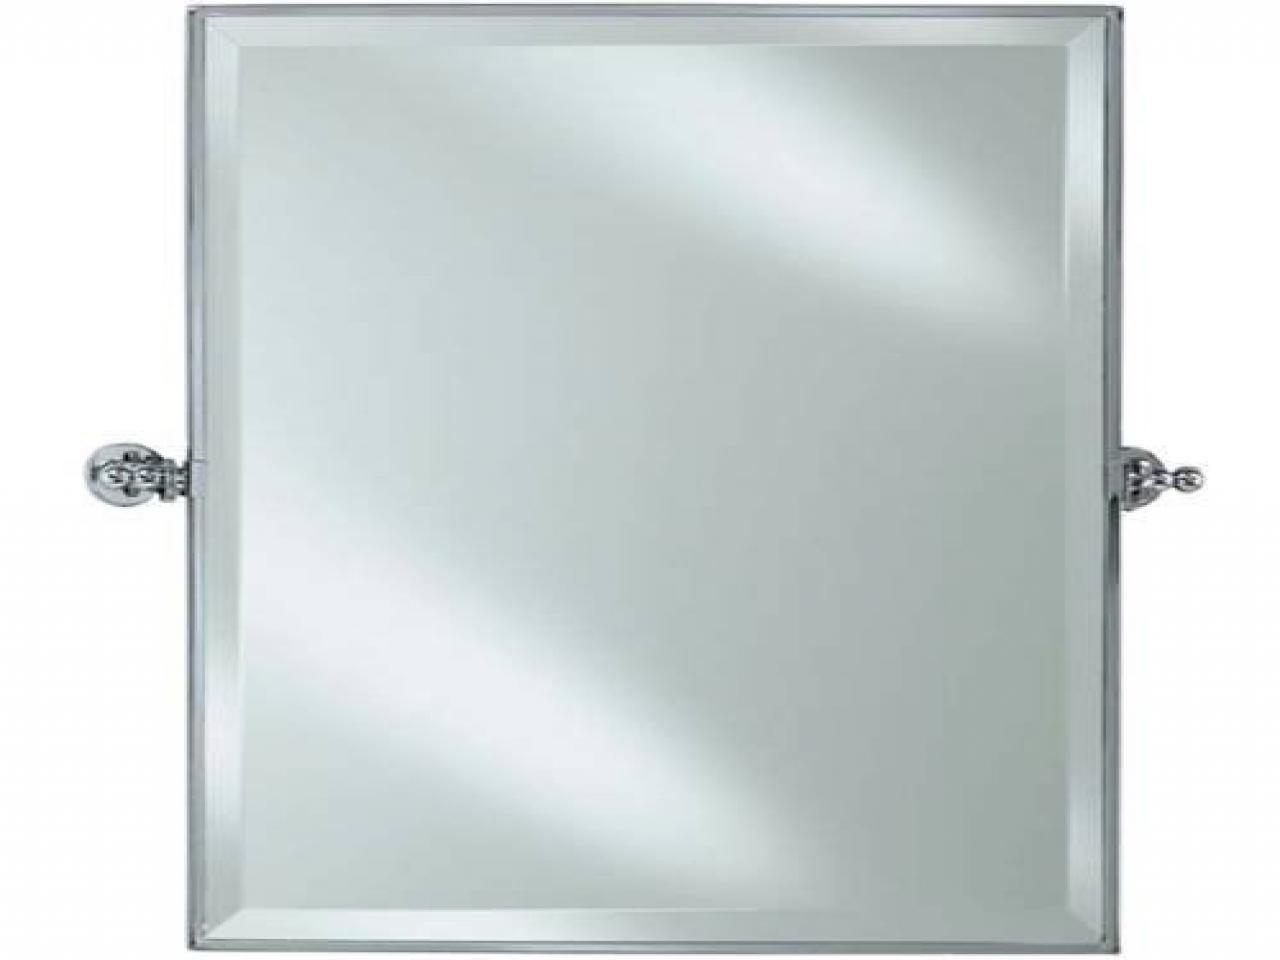 Bathroom Mirrors : Fresh Adjustable Bathroom Wall Mirrors Luxury In Adjustable Bathroom Mirrors (Image 12 of 20)